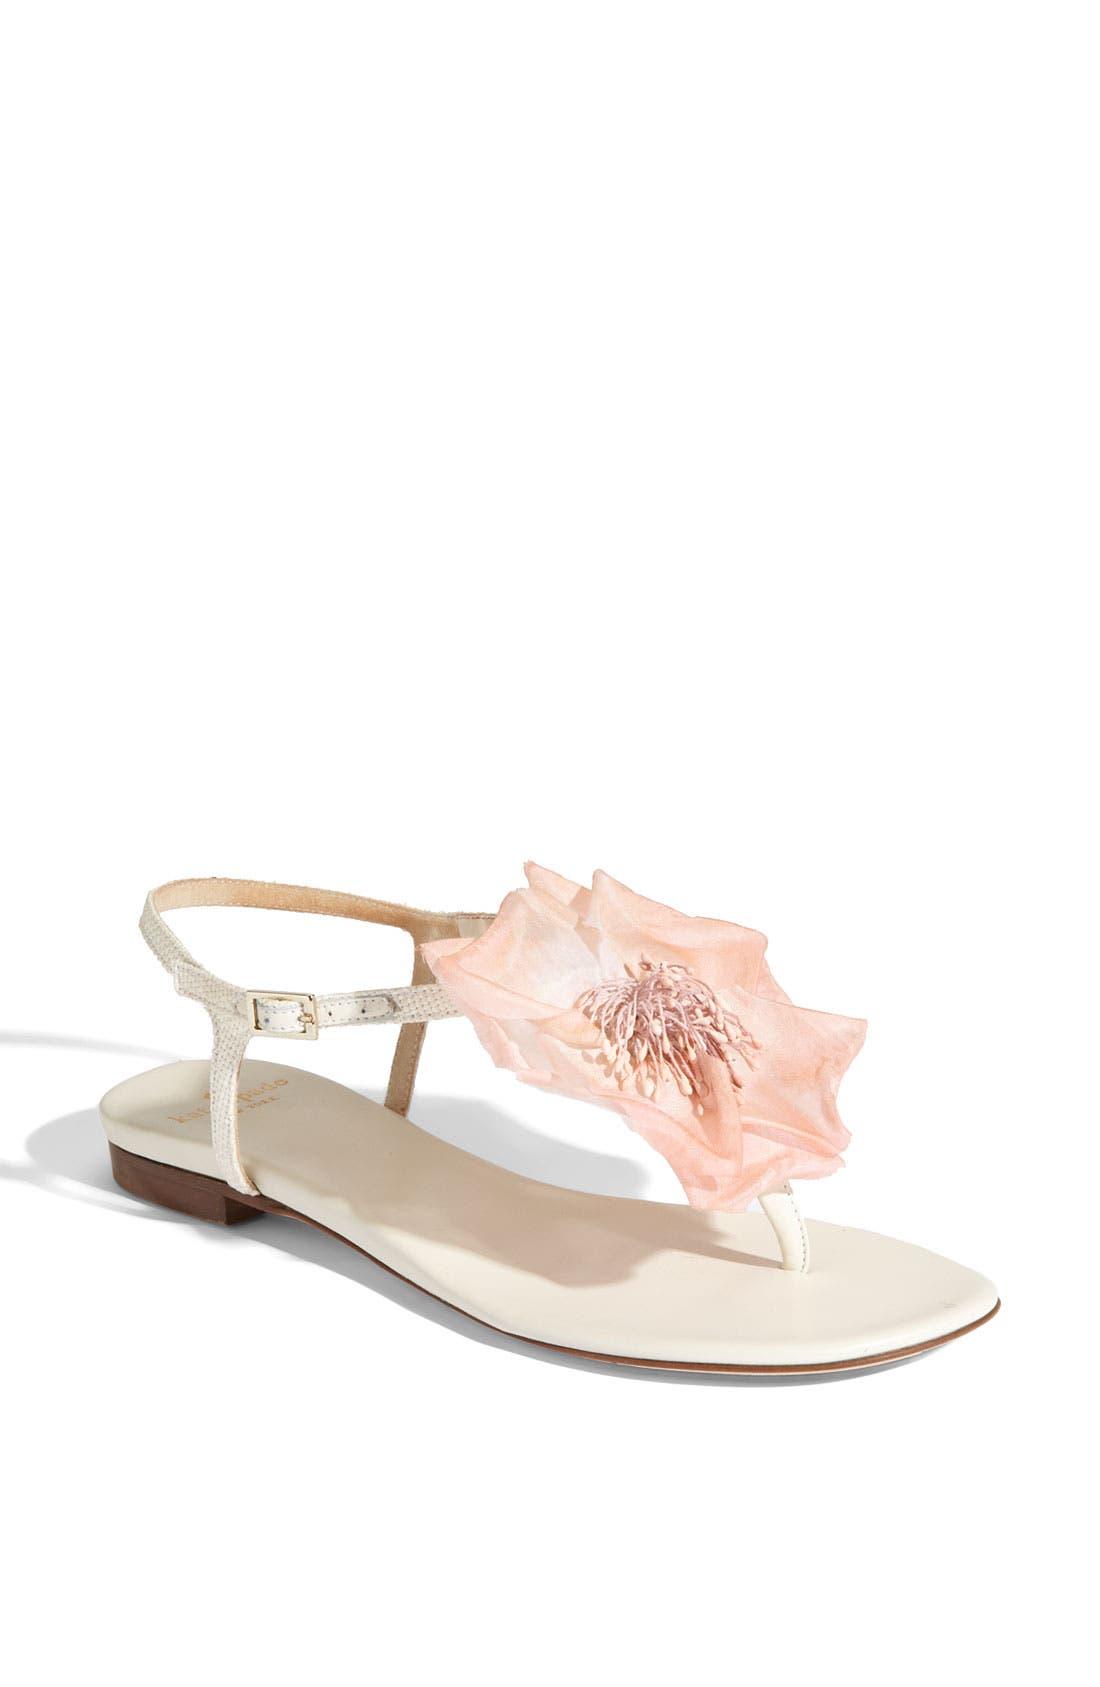 Alternate Image 1 Selected - kate spade new york 'florina' sandal